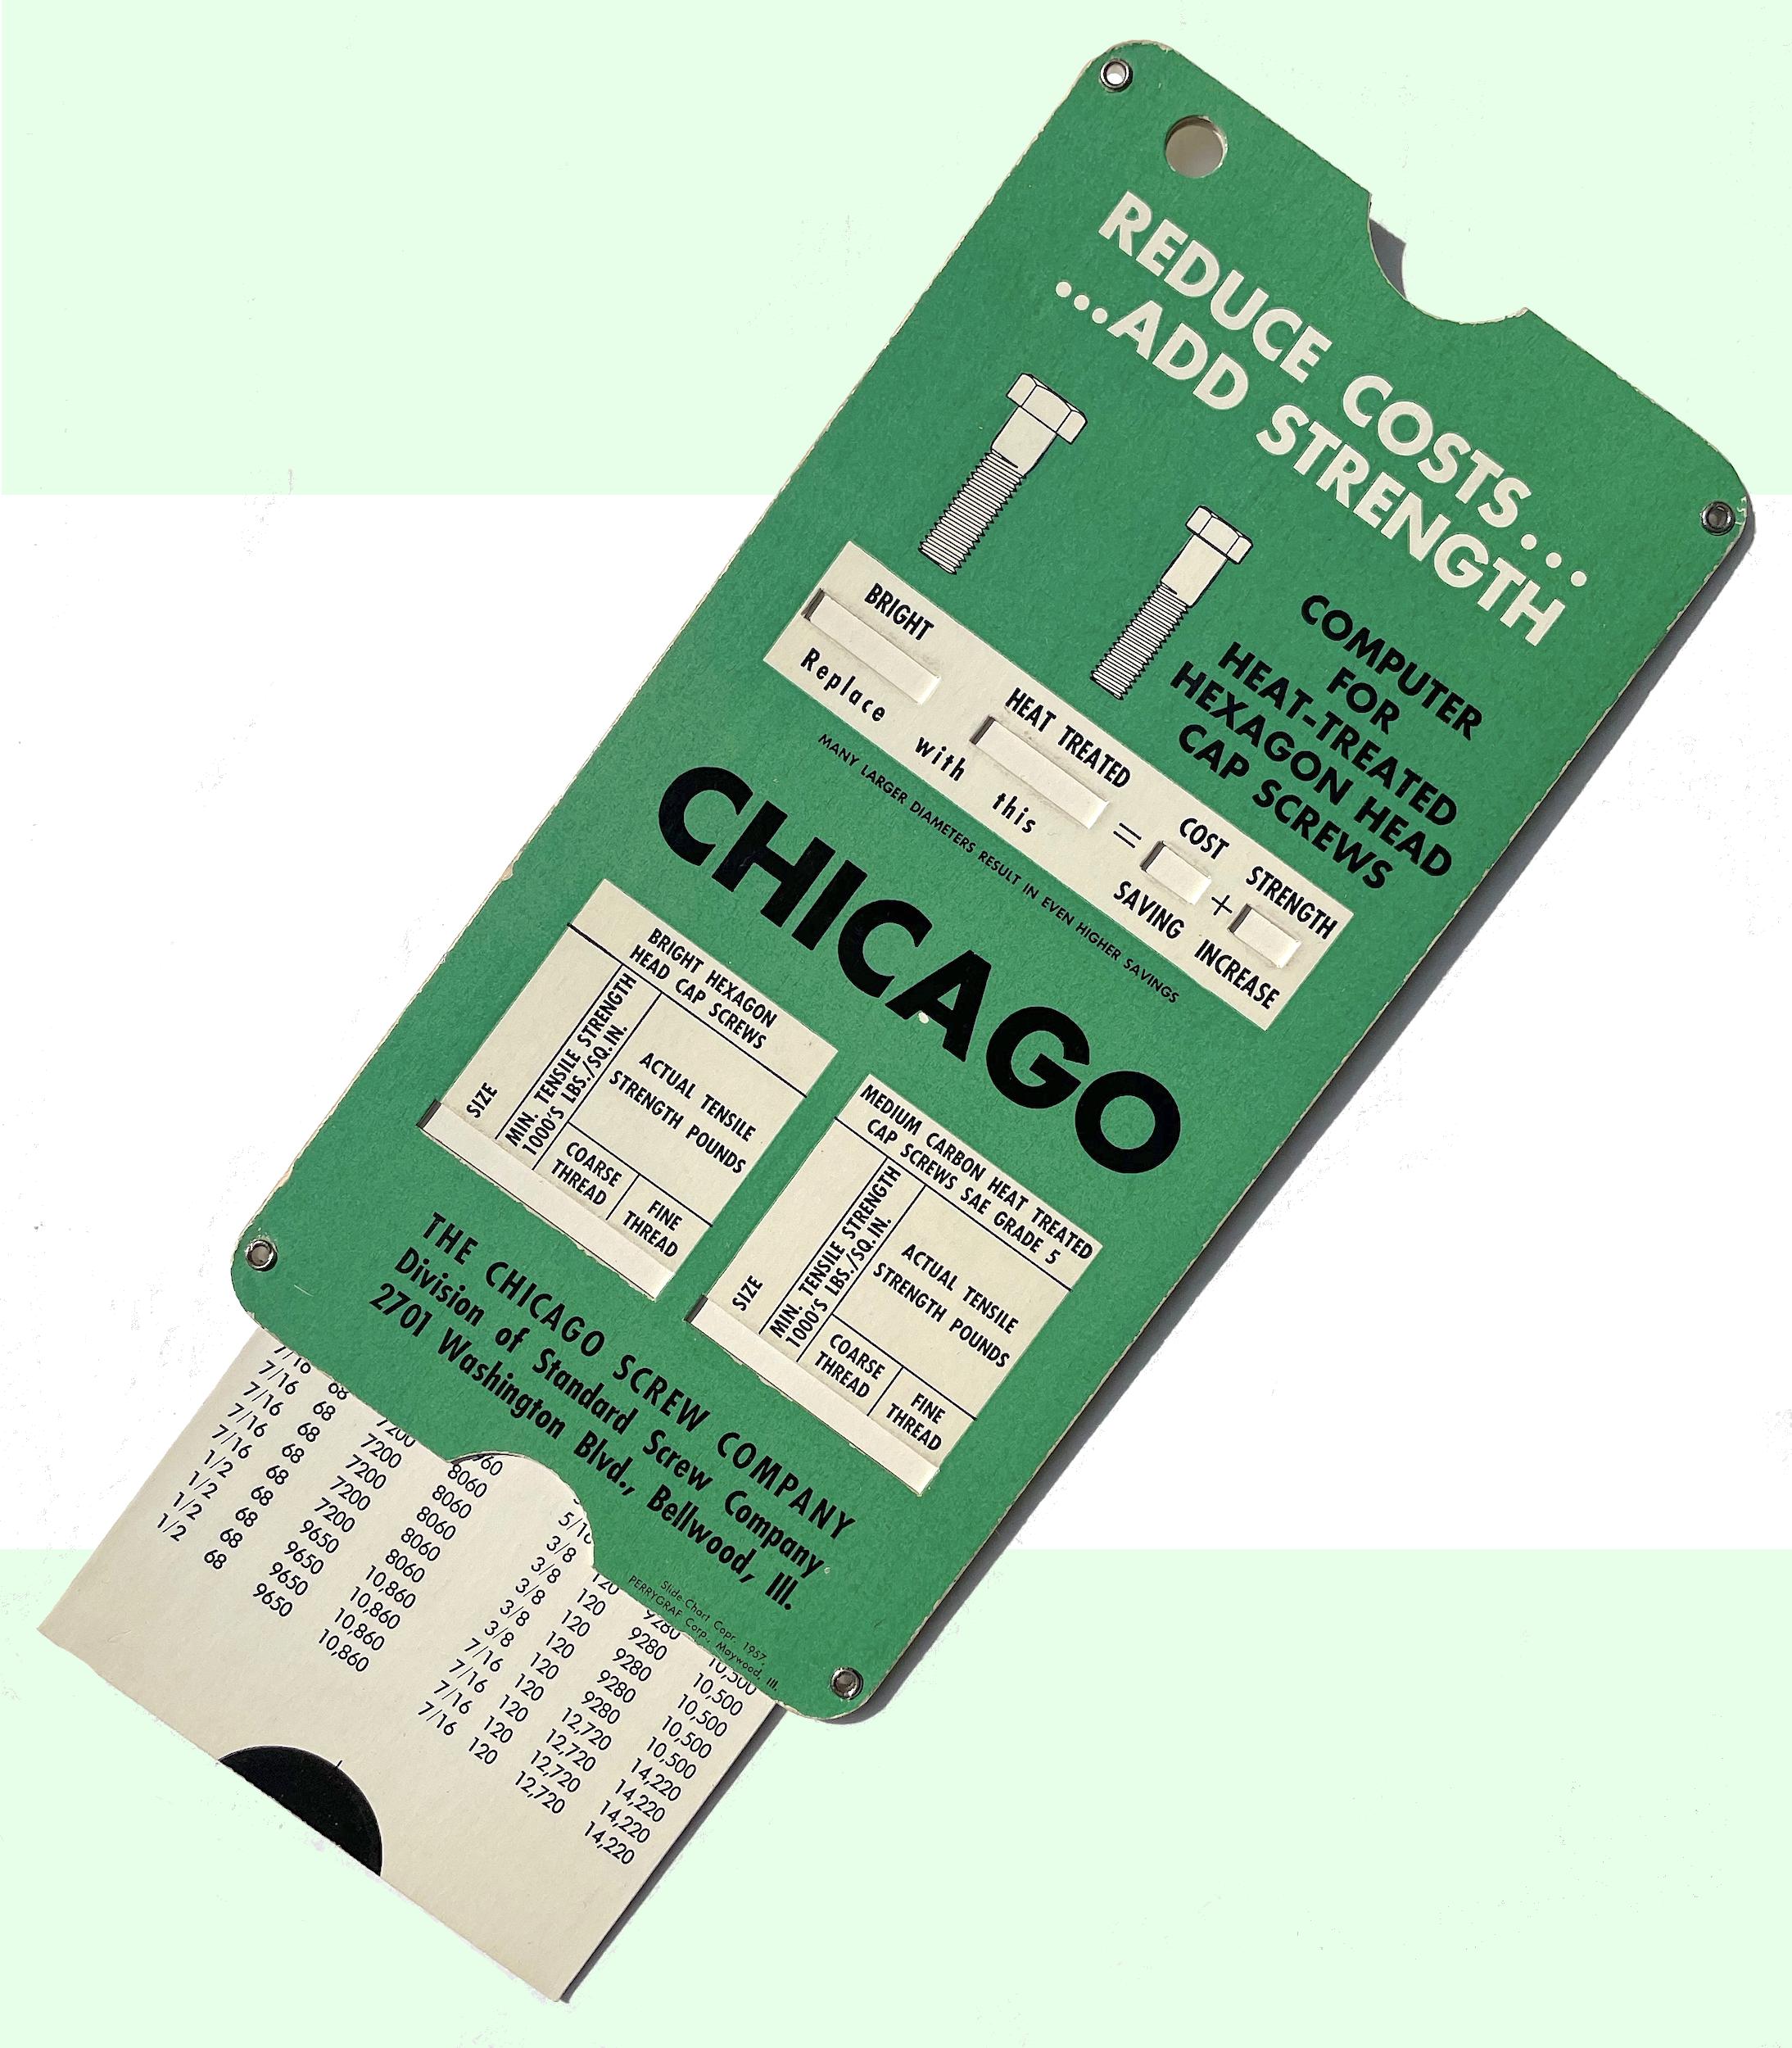 Chicago Screw Company, est. 1872